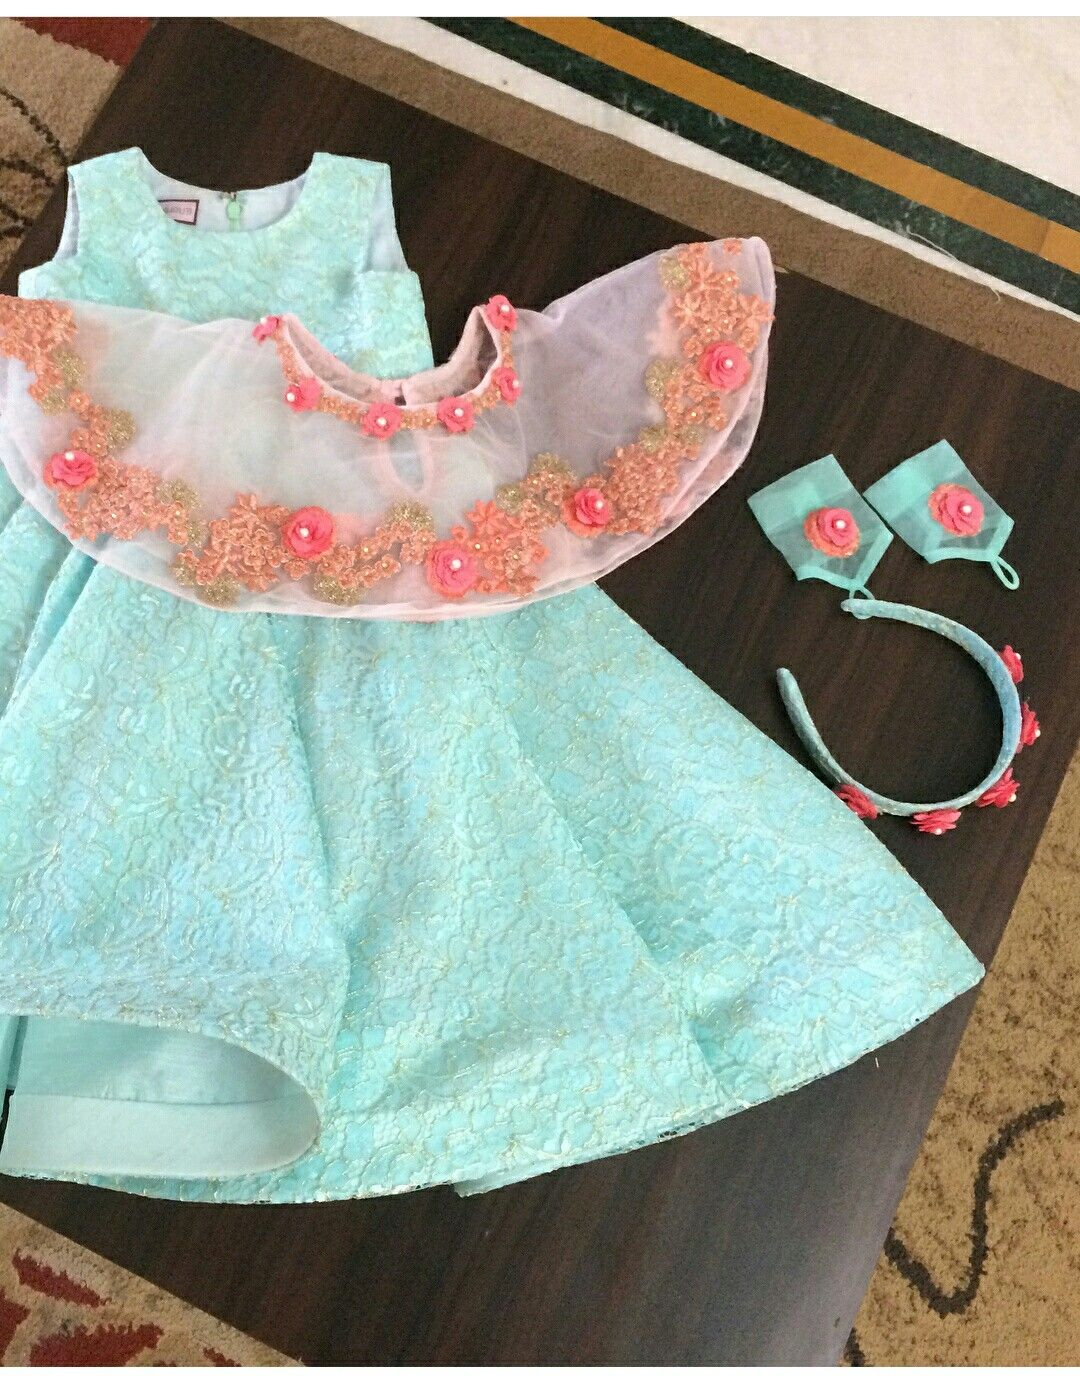 Pin de Teju Reddy en kids clothing | Pinterest | Vestidos de niñas ...